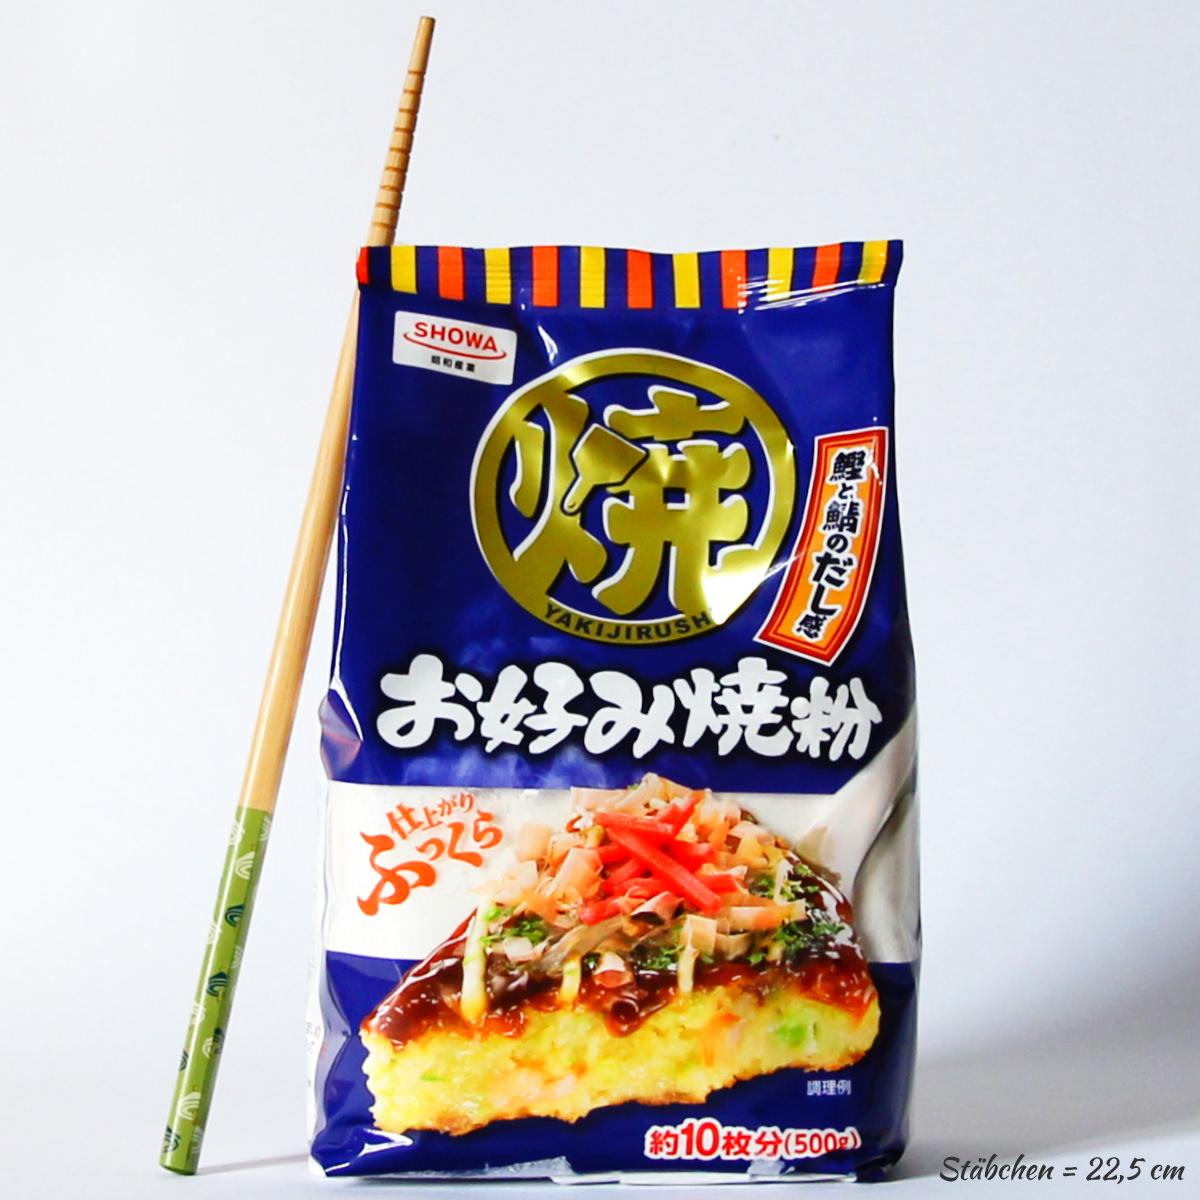 Okonomiyakiko 500g (Okonomiyakiteig-Mehlmischung), SHOWA